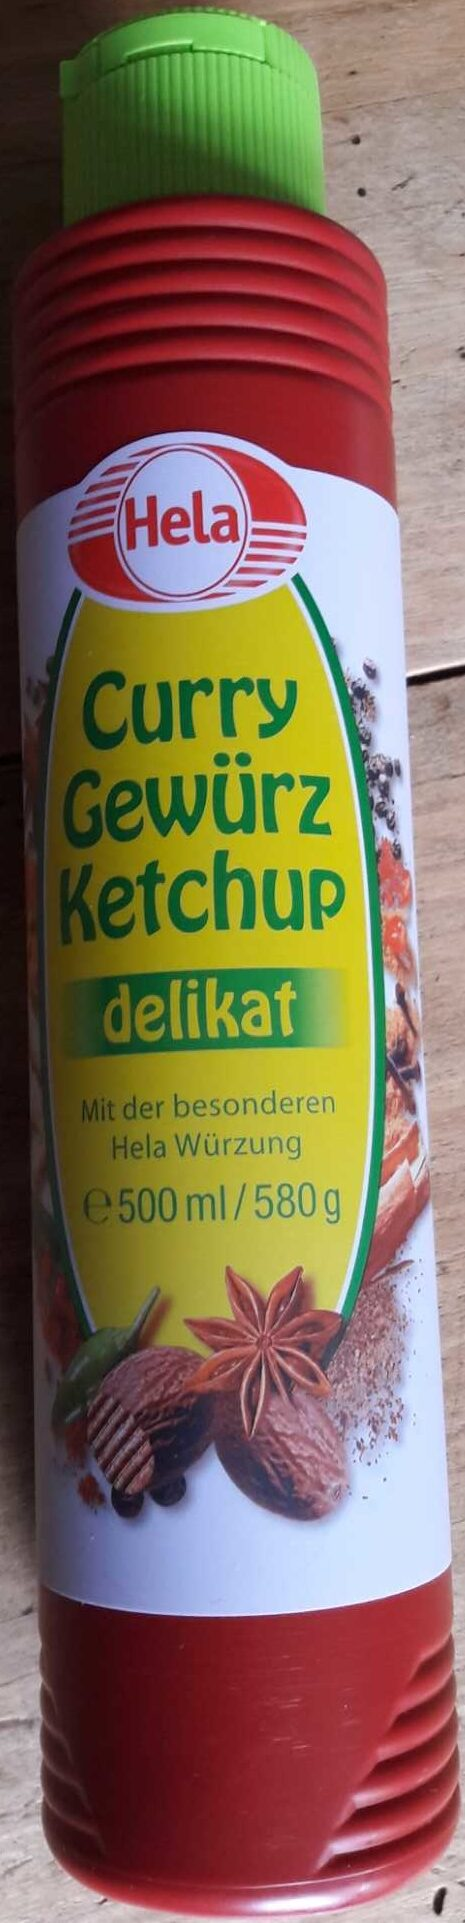 Curry Gewürz Ketchup delikat - Product - de